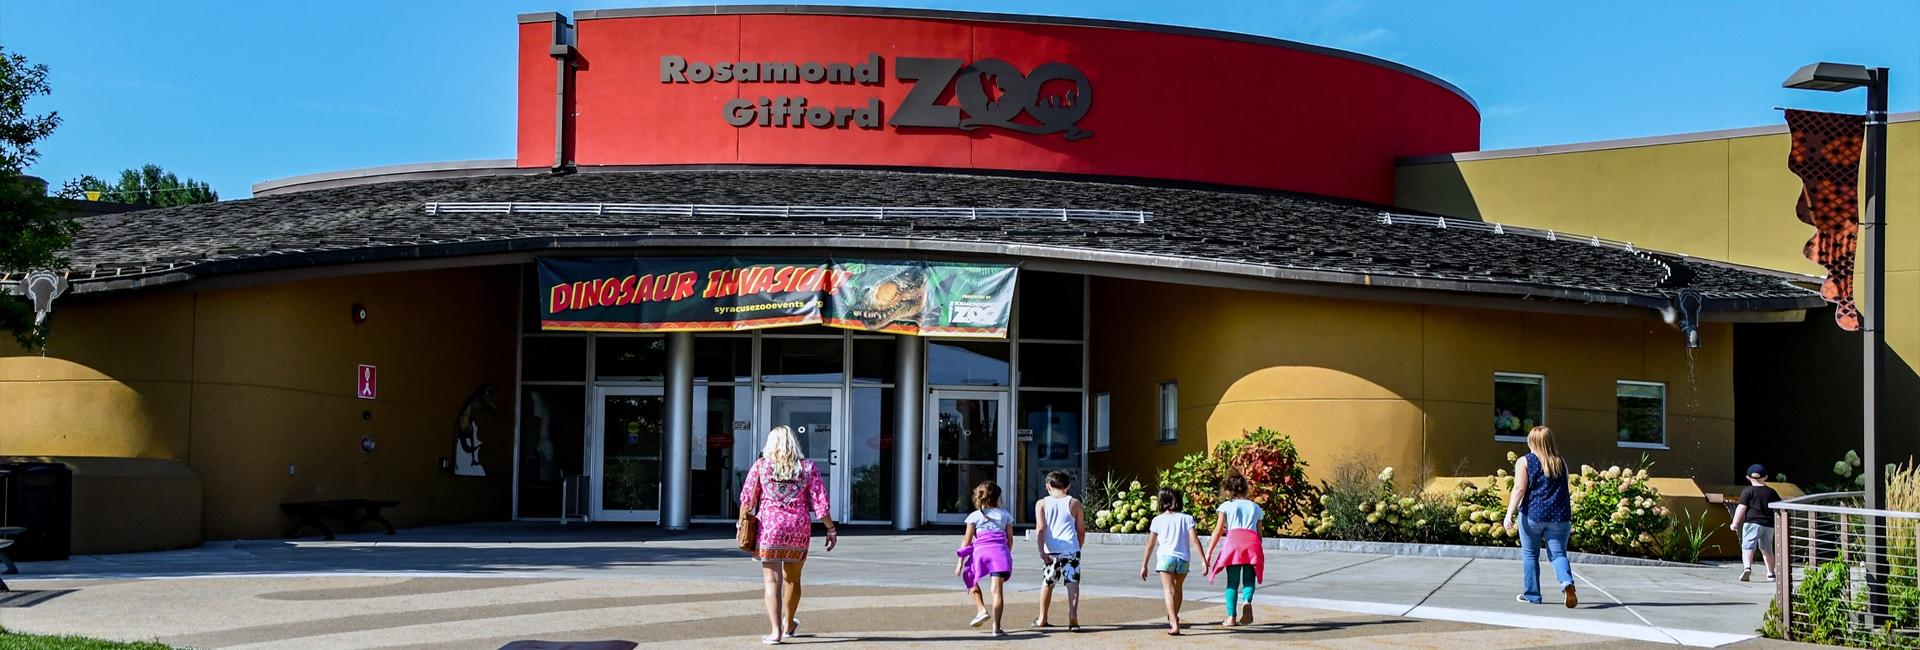 Rosamund Gifford Zoo | Lisa Ballard